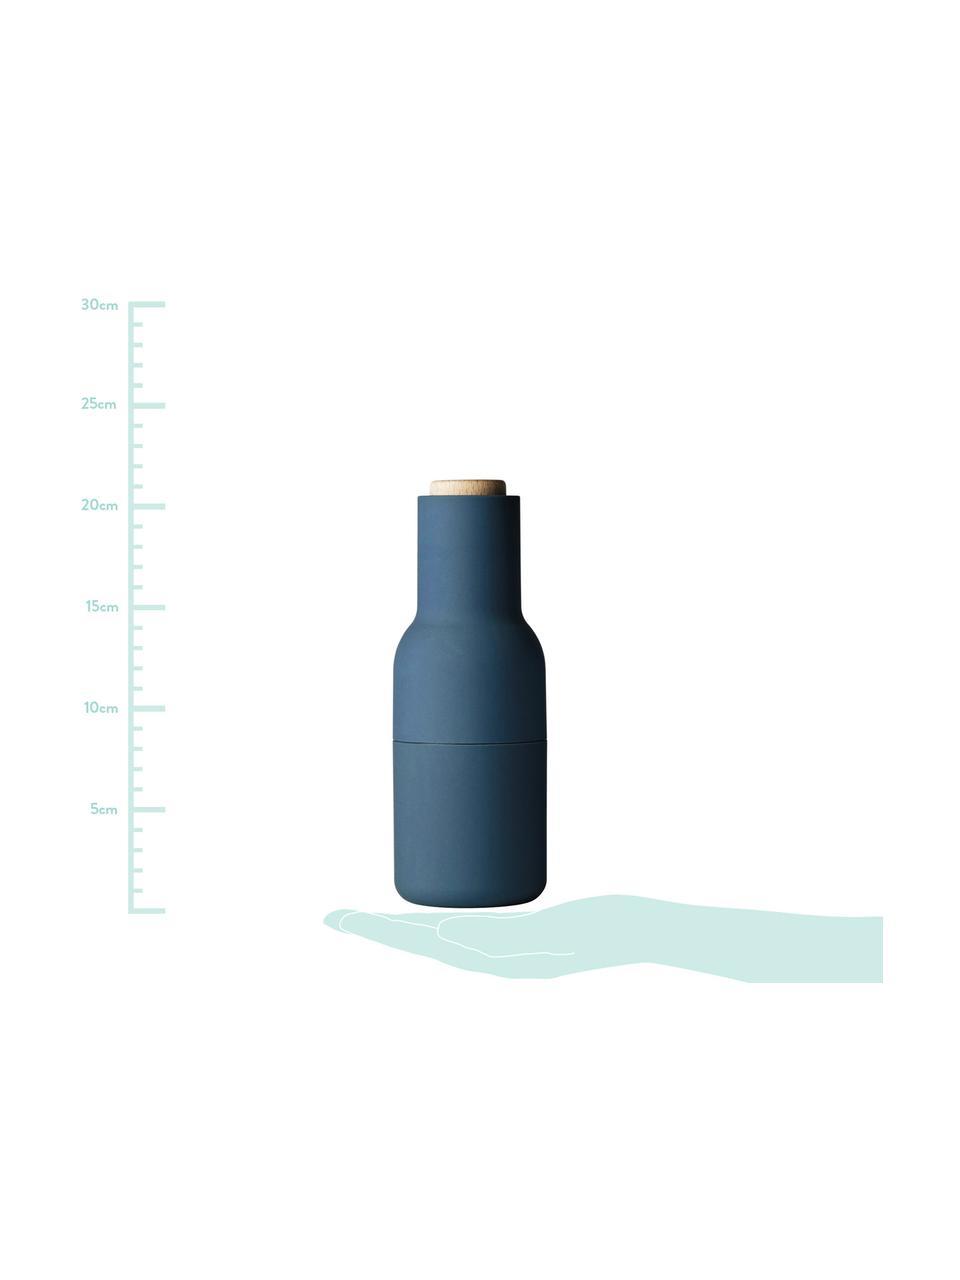 Designer Salz- & Pfeffermühle Bottle Grinder mit Holzdeckel, Korpus: Kunststoff, Mahlwerk: Keramik, Deckel: Holz, Blau, Hellblau, Braun, Ø 8 x H 21 cm